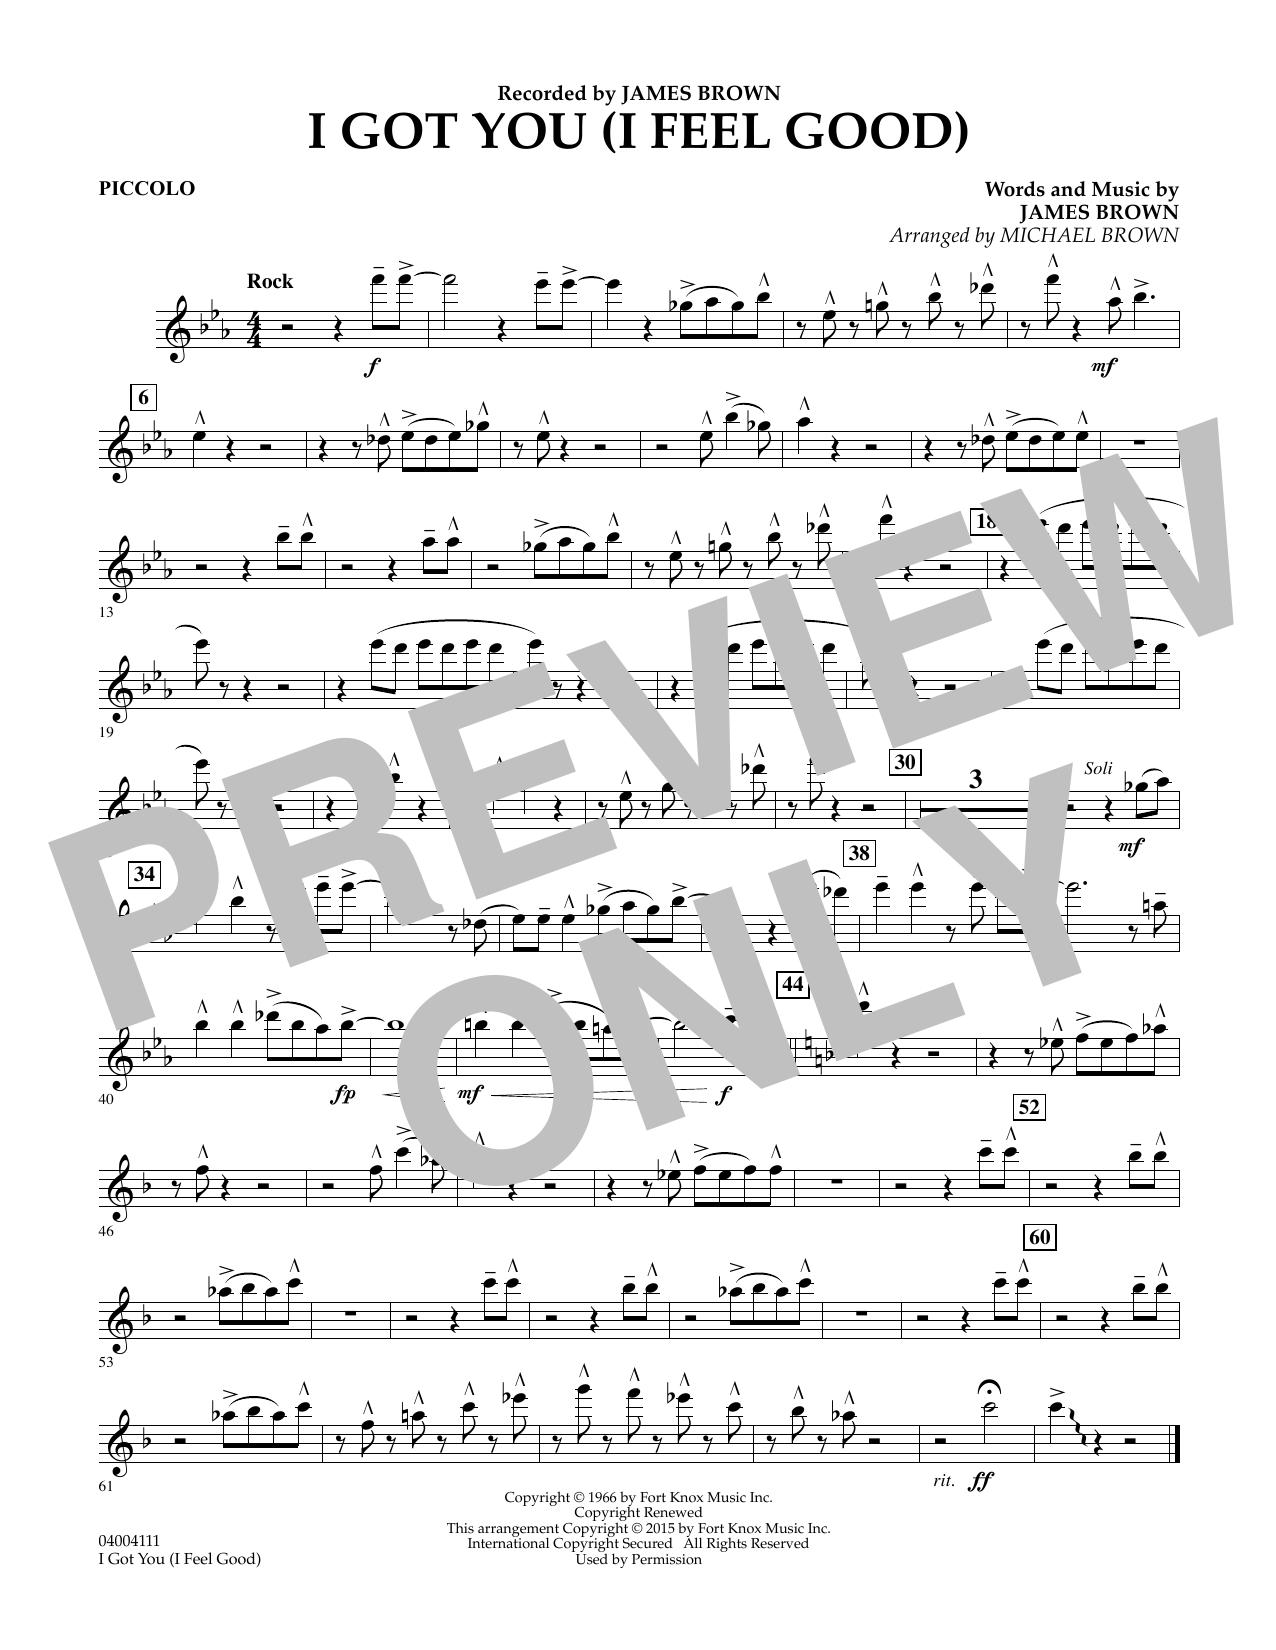 I Got You (I Feel Good) - Piccolo (Concert Band)